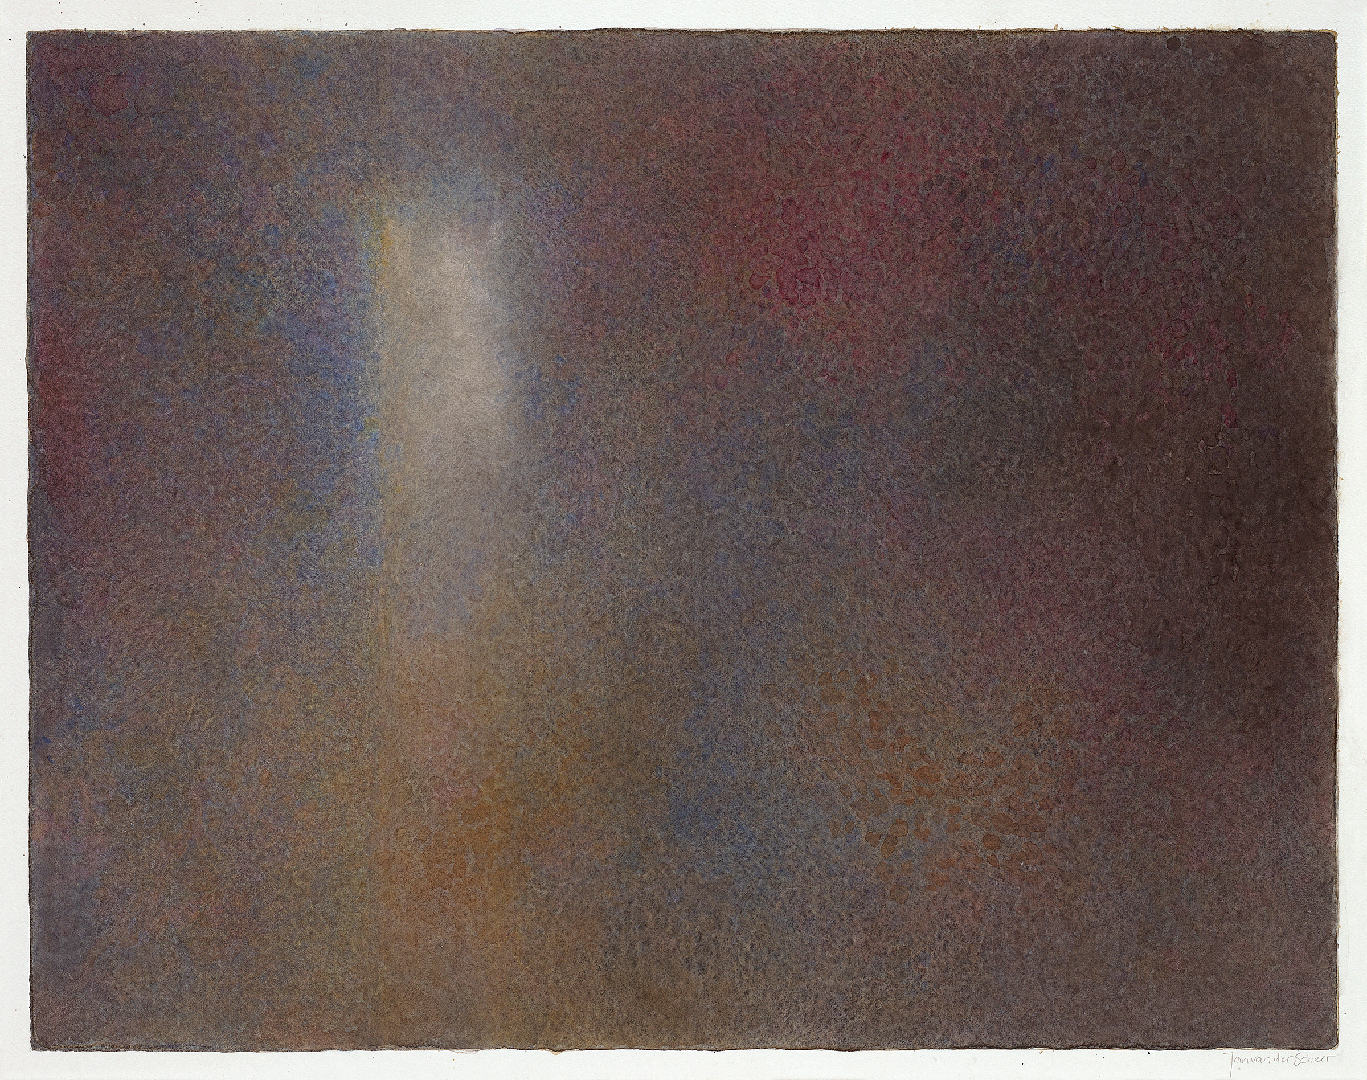 2011 Licht in donker (47 X 60 cm) 15154w